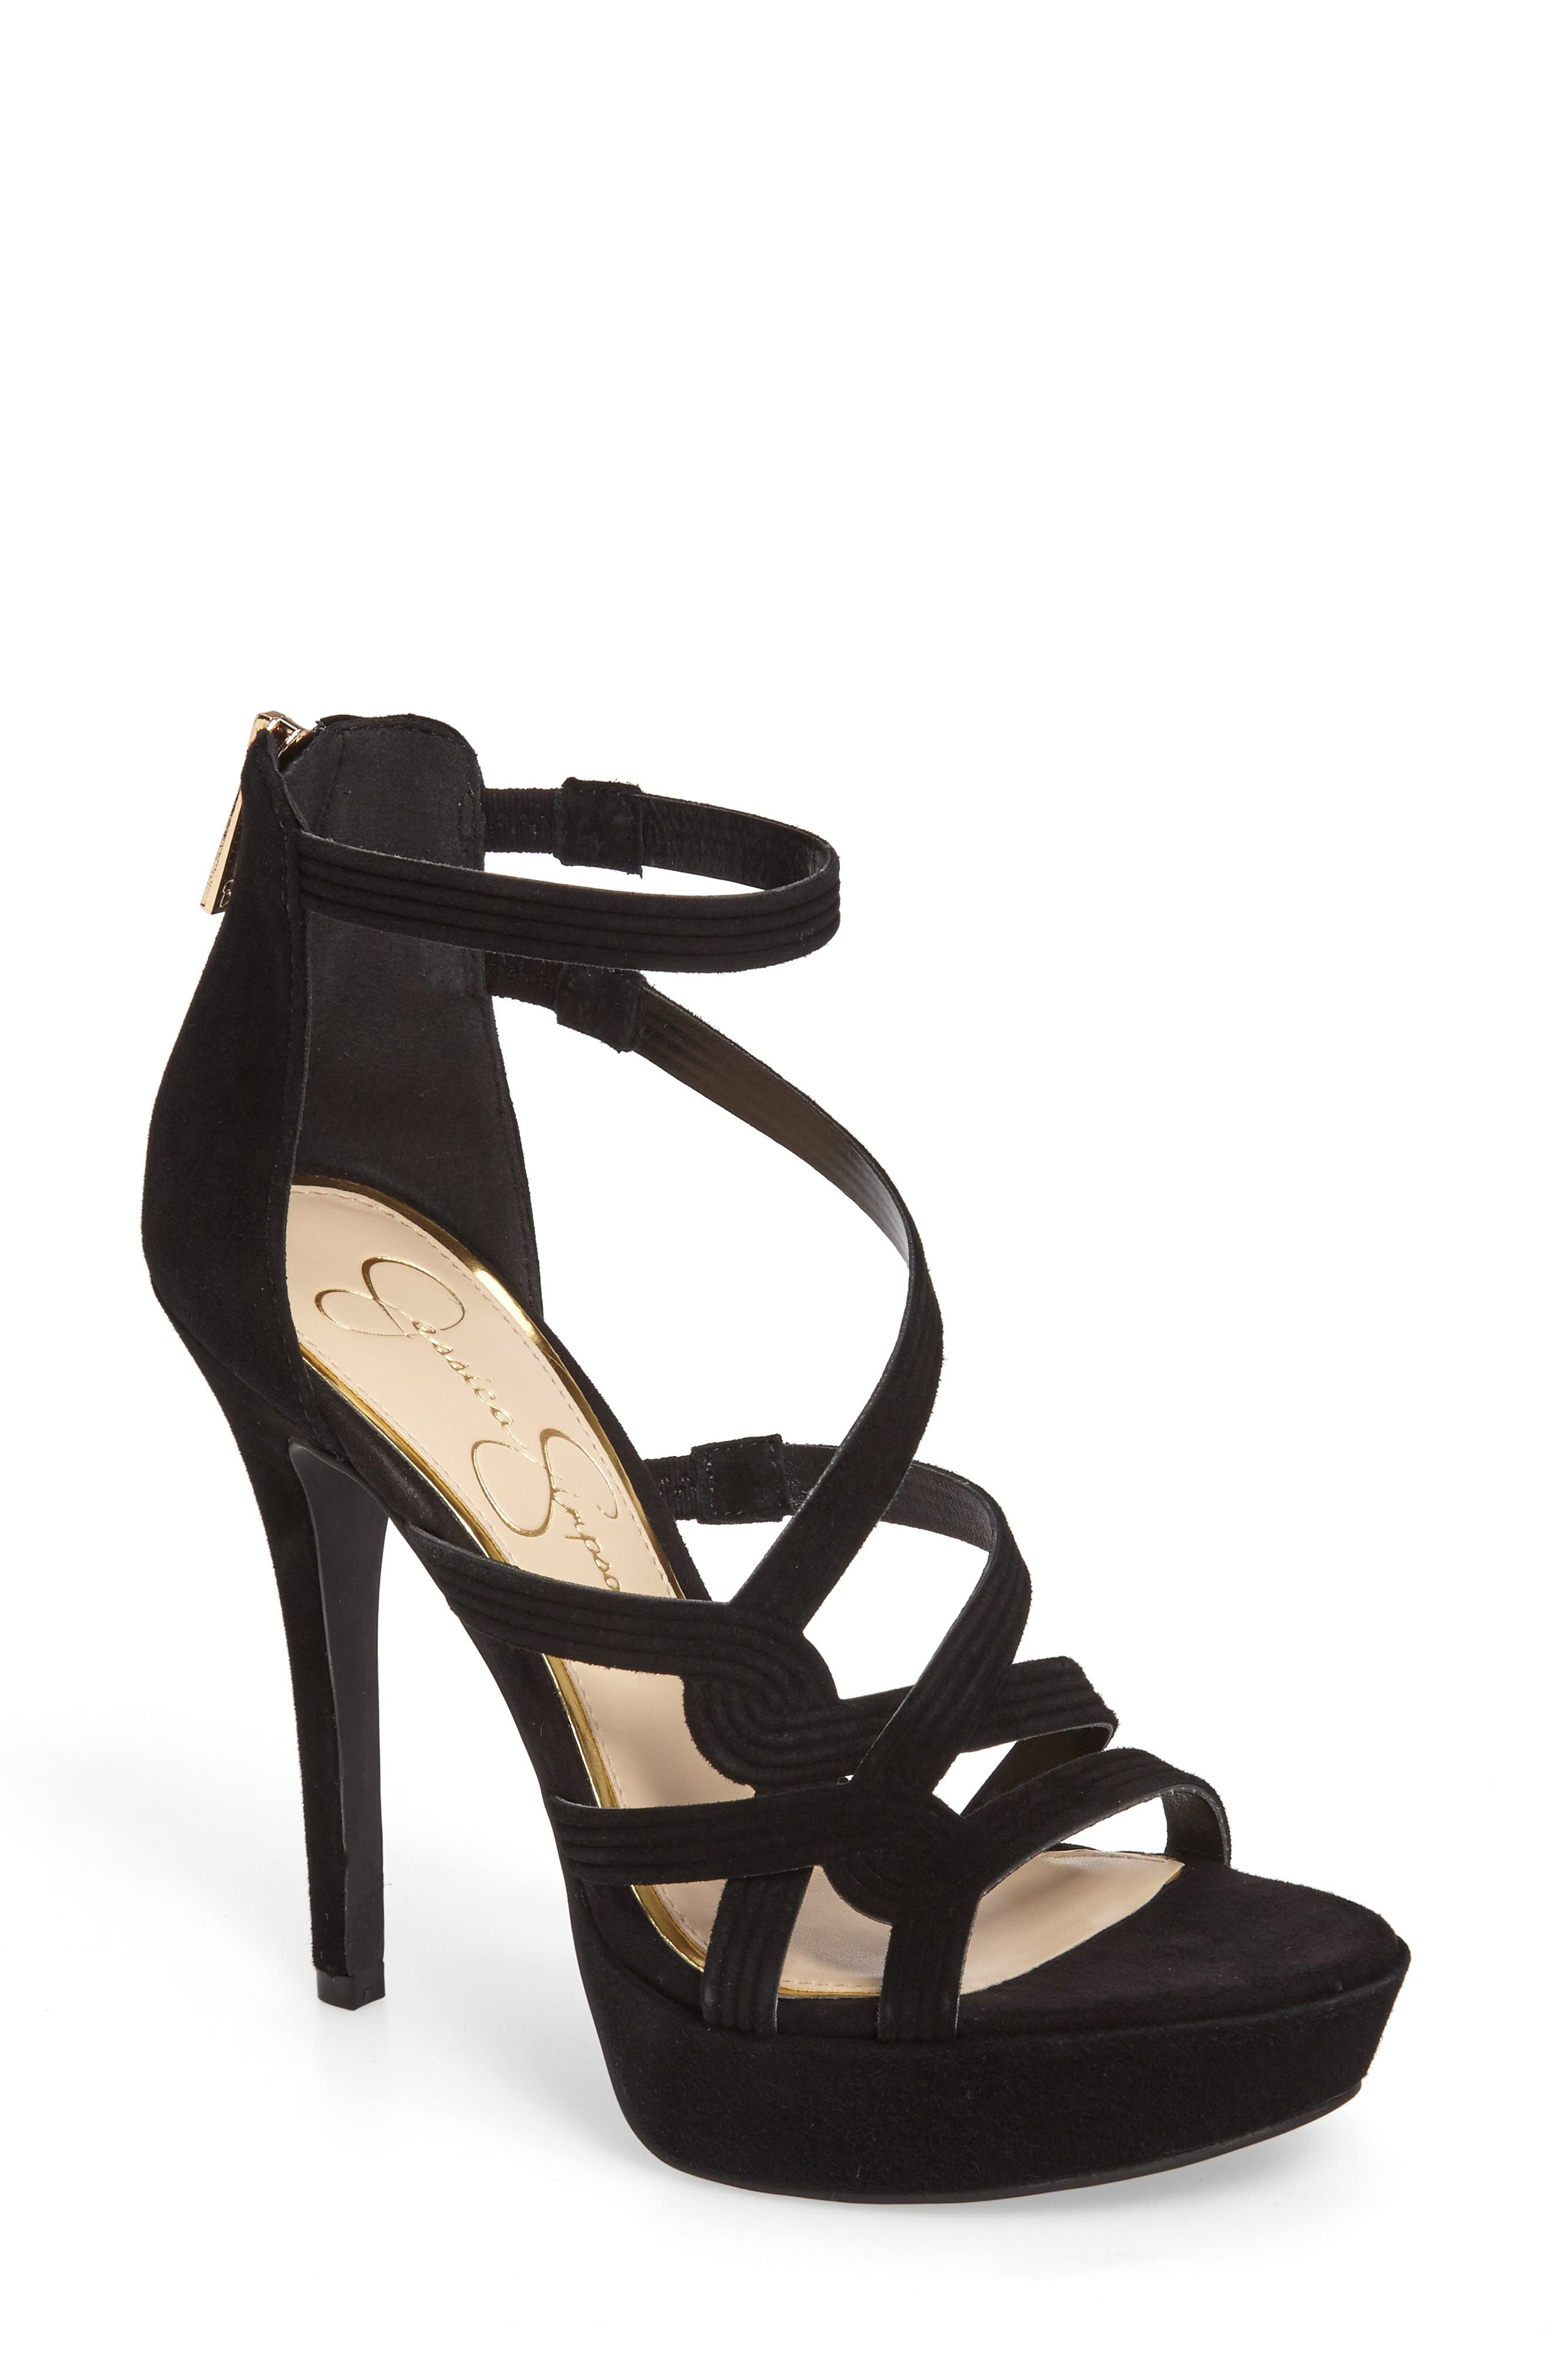 Alternate Image 1 Selected - Jessica Simpson Bellanne Platform Sandal (Women)